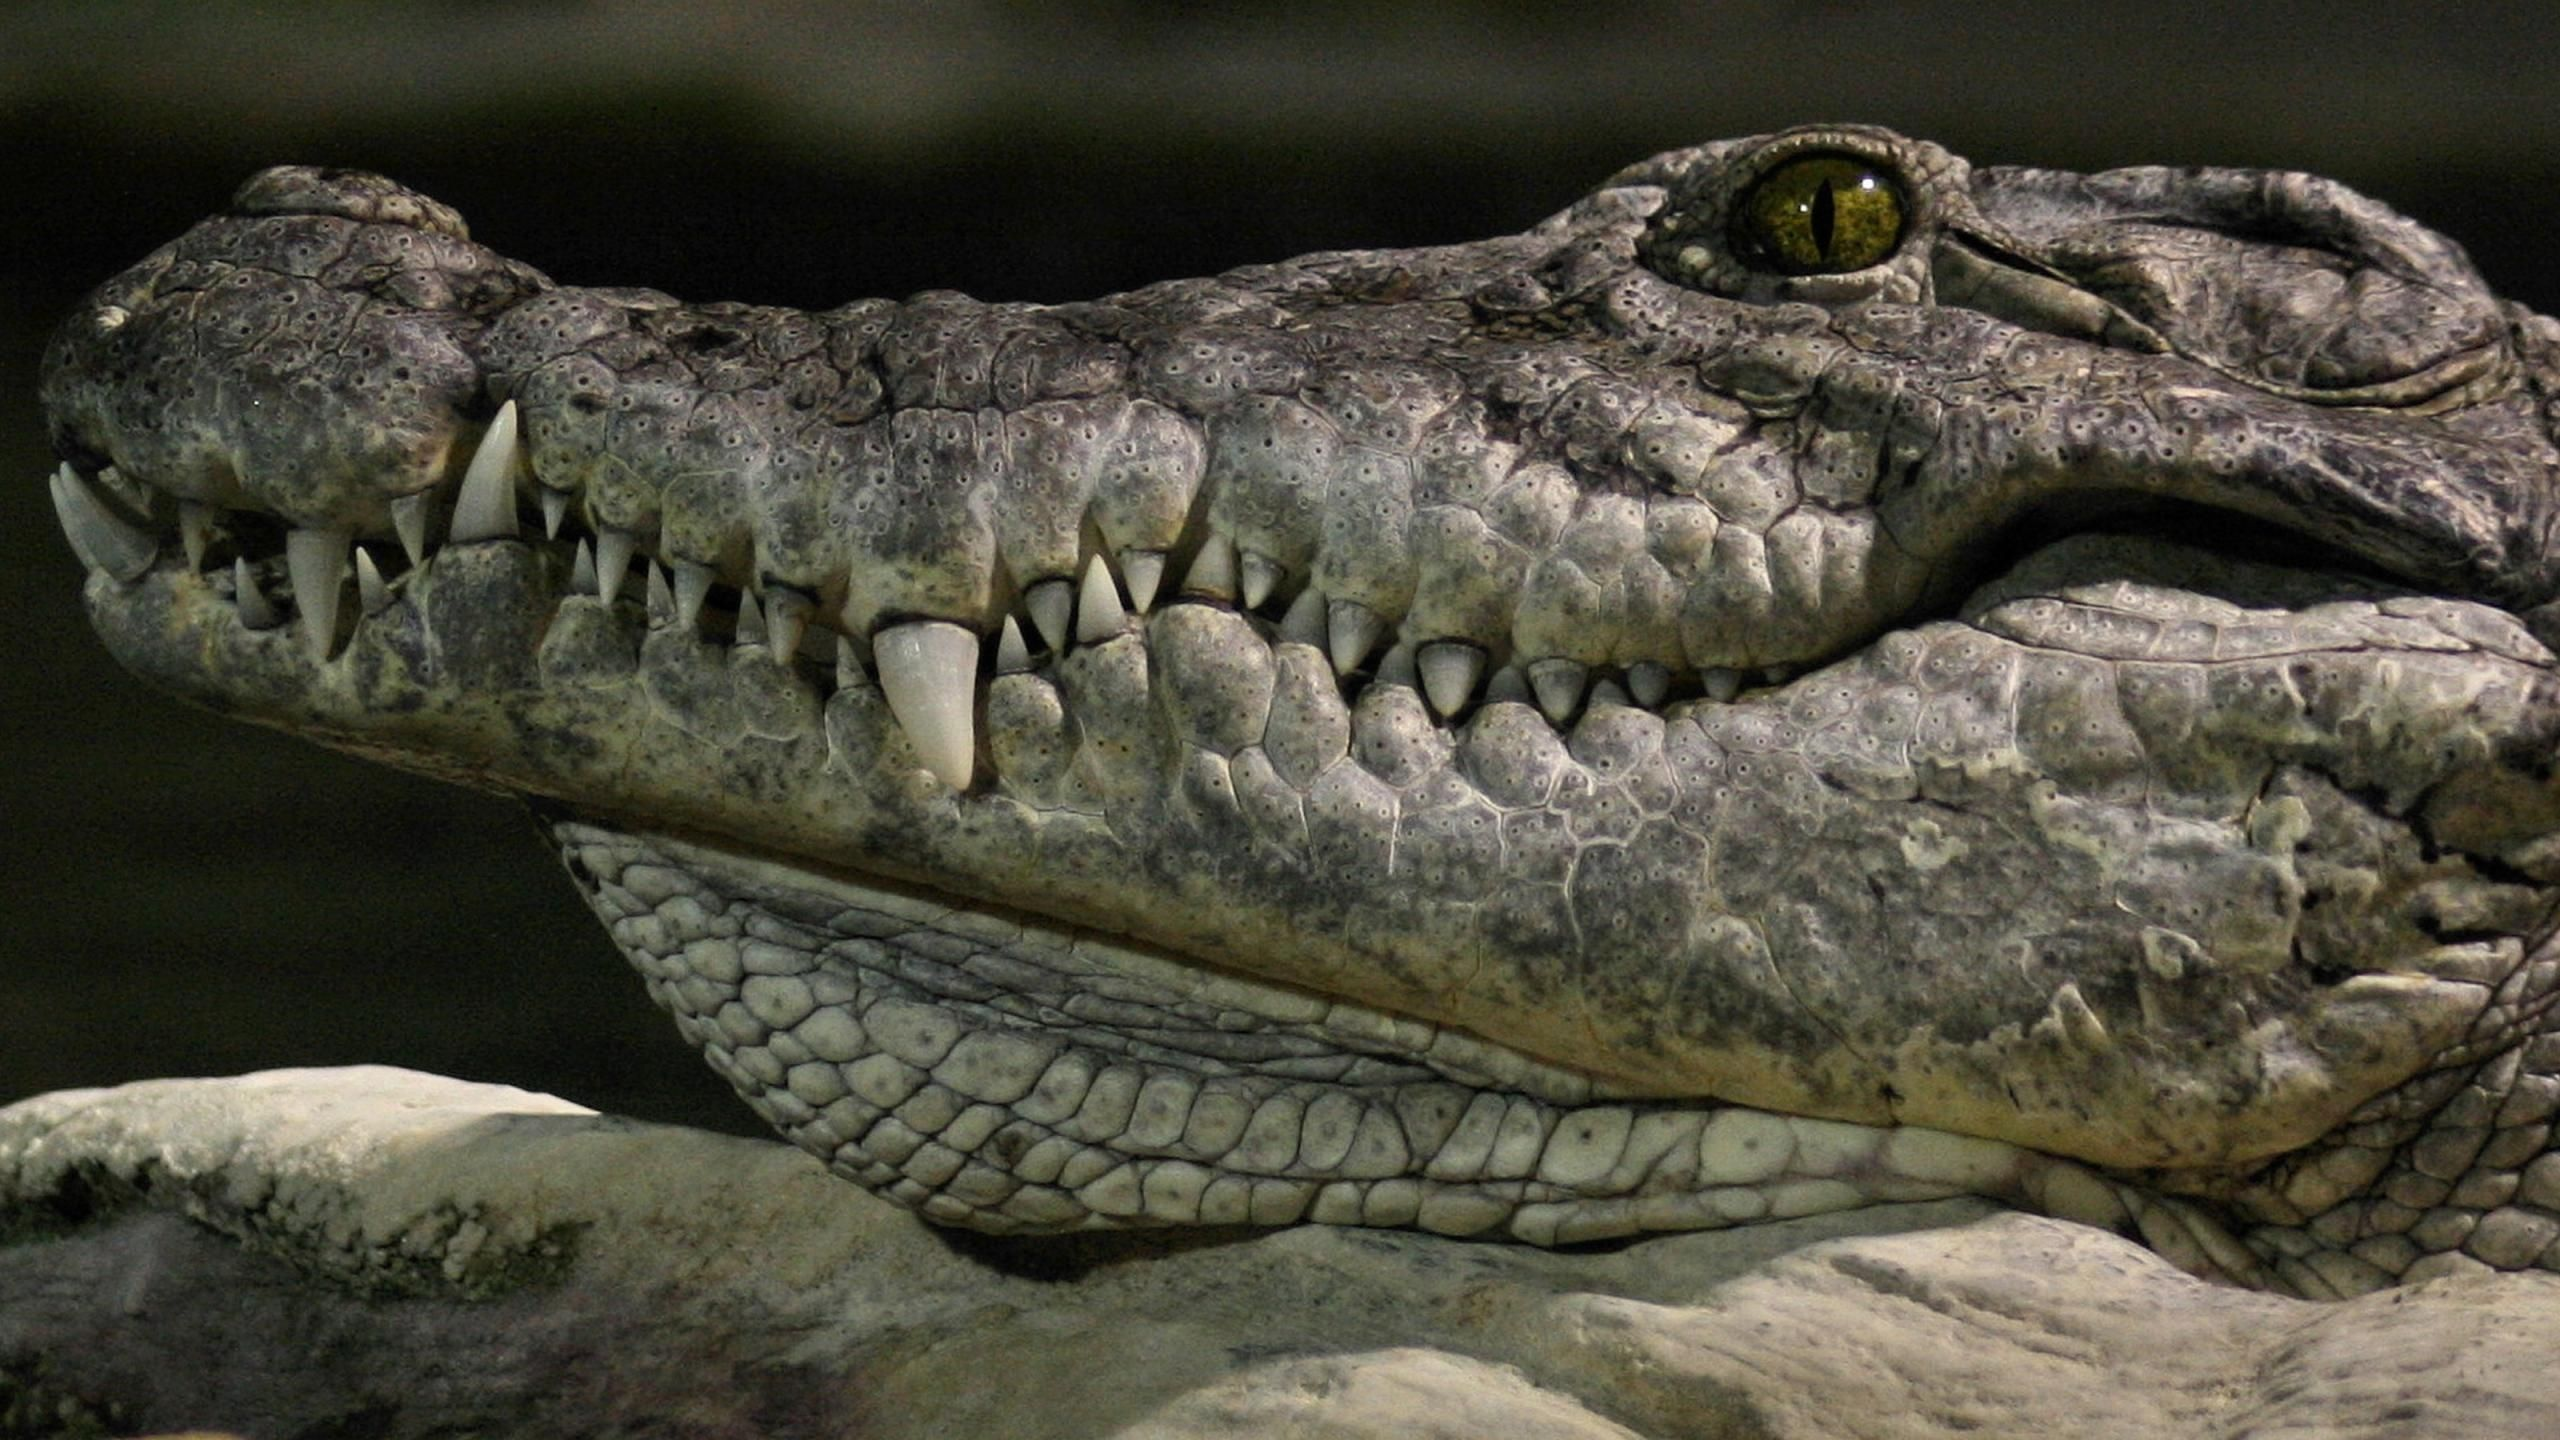 american crocodile | Crocodilians | Pinterest | American crocodile ...